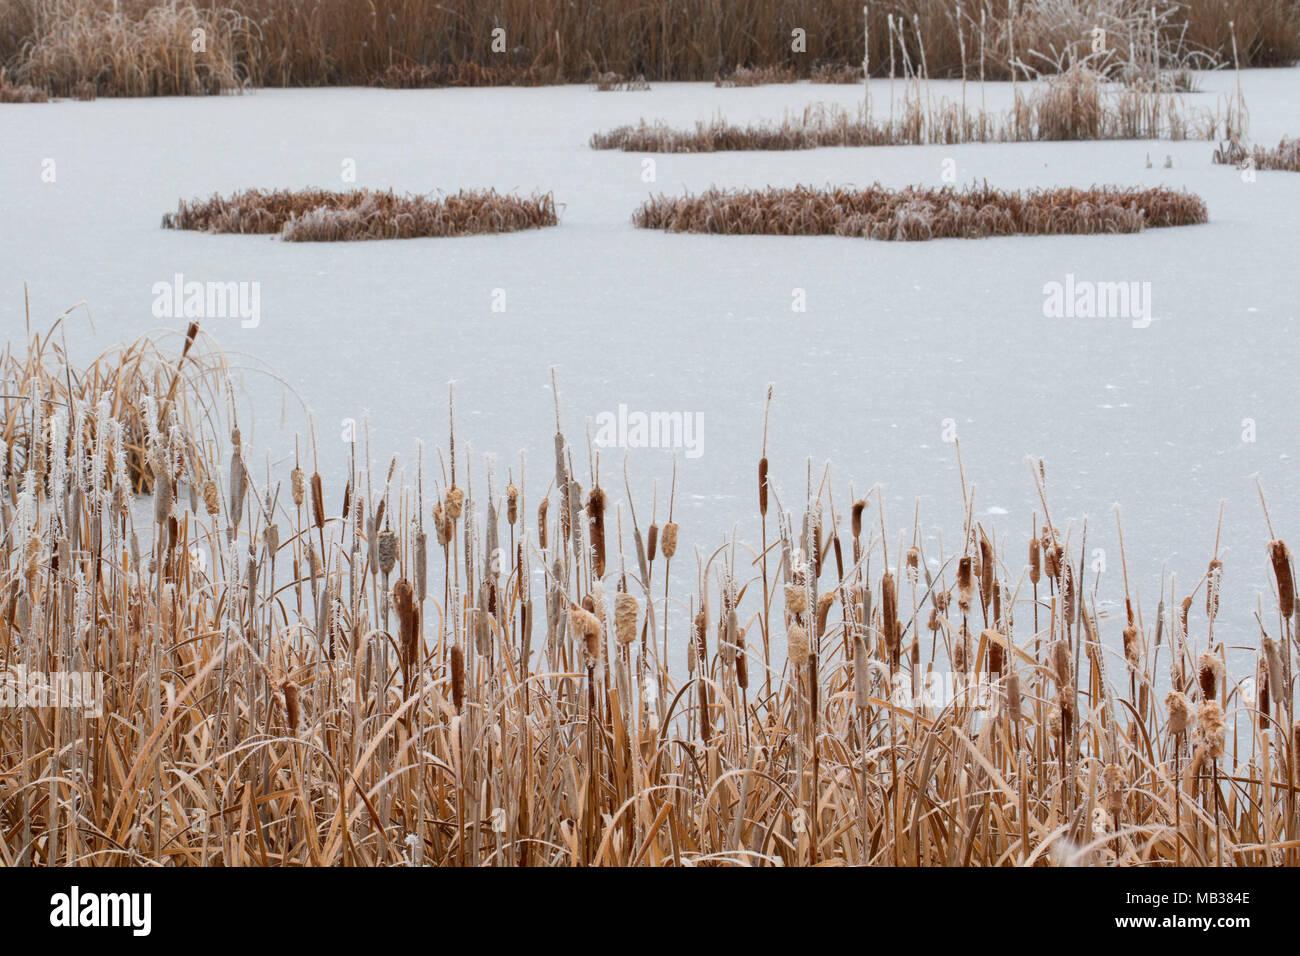 Visitor Center pond cattails with ice, Bear River Migratory Bird Refuge, Utah - Stock Image